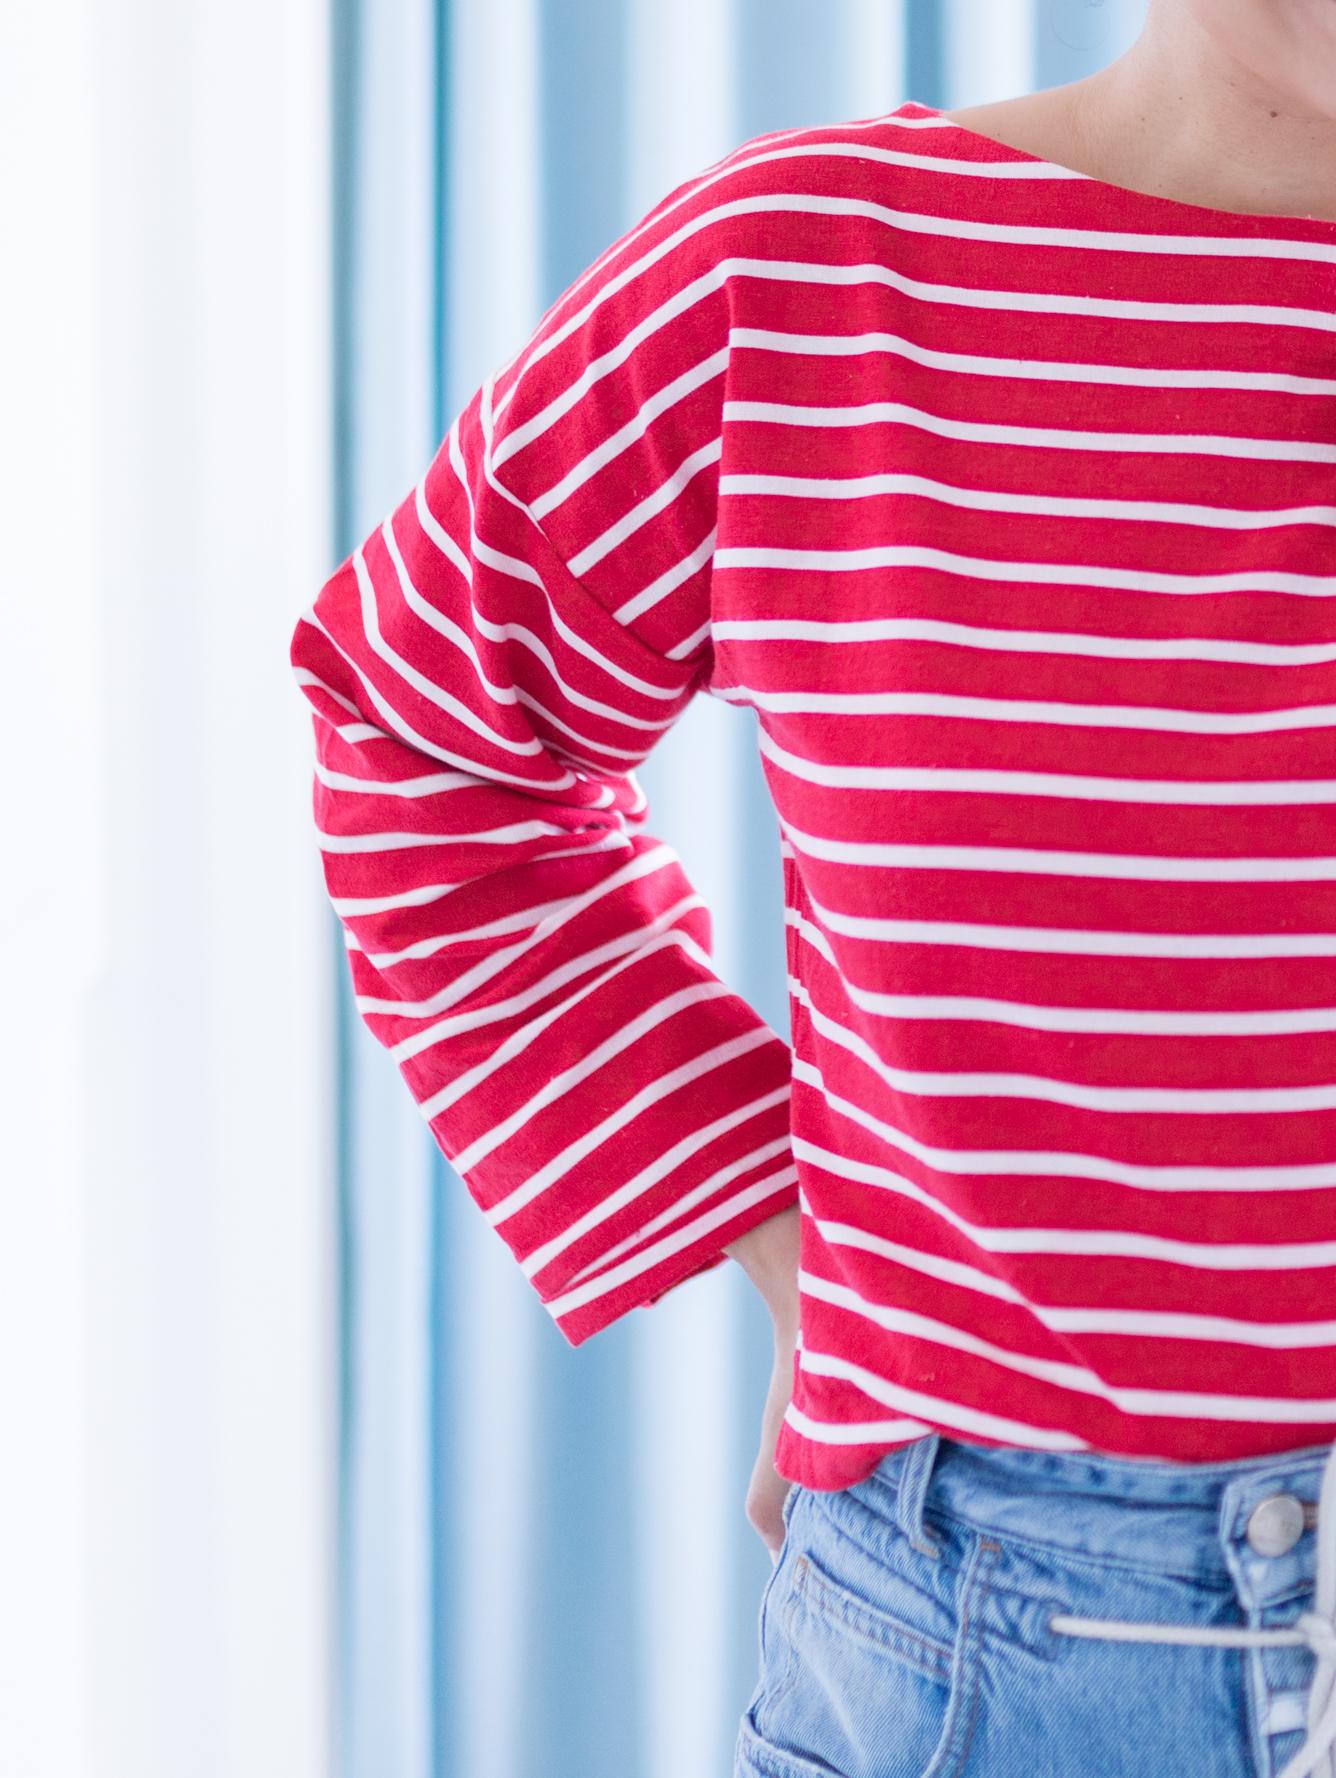 Schnittmuster Blusenshirt Bloom mit langen Ärmeln nähen - Schnittduett